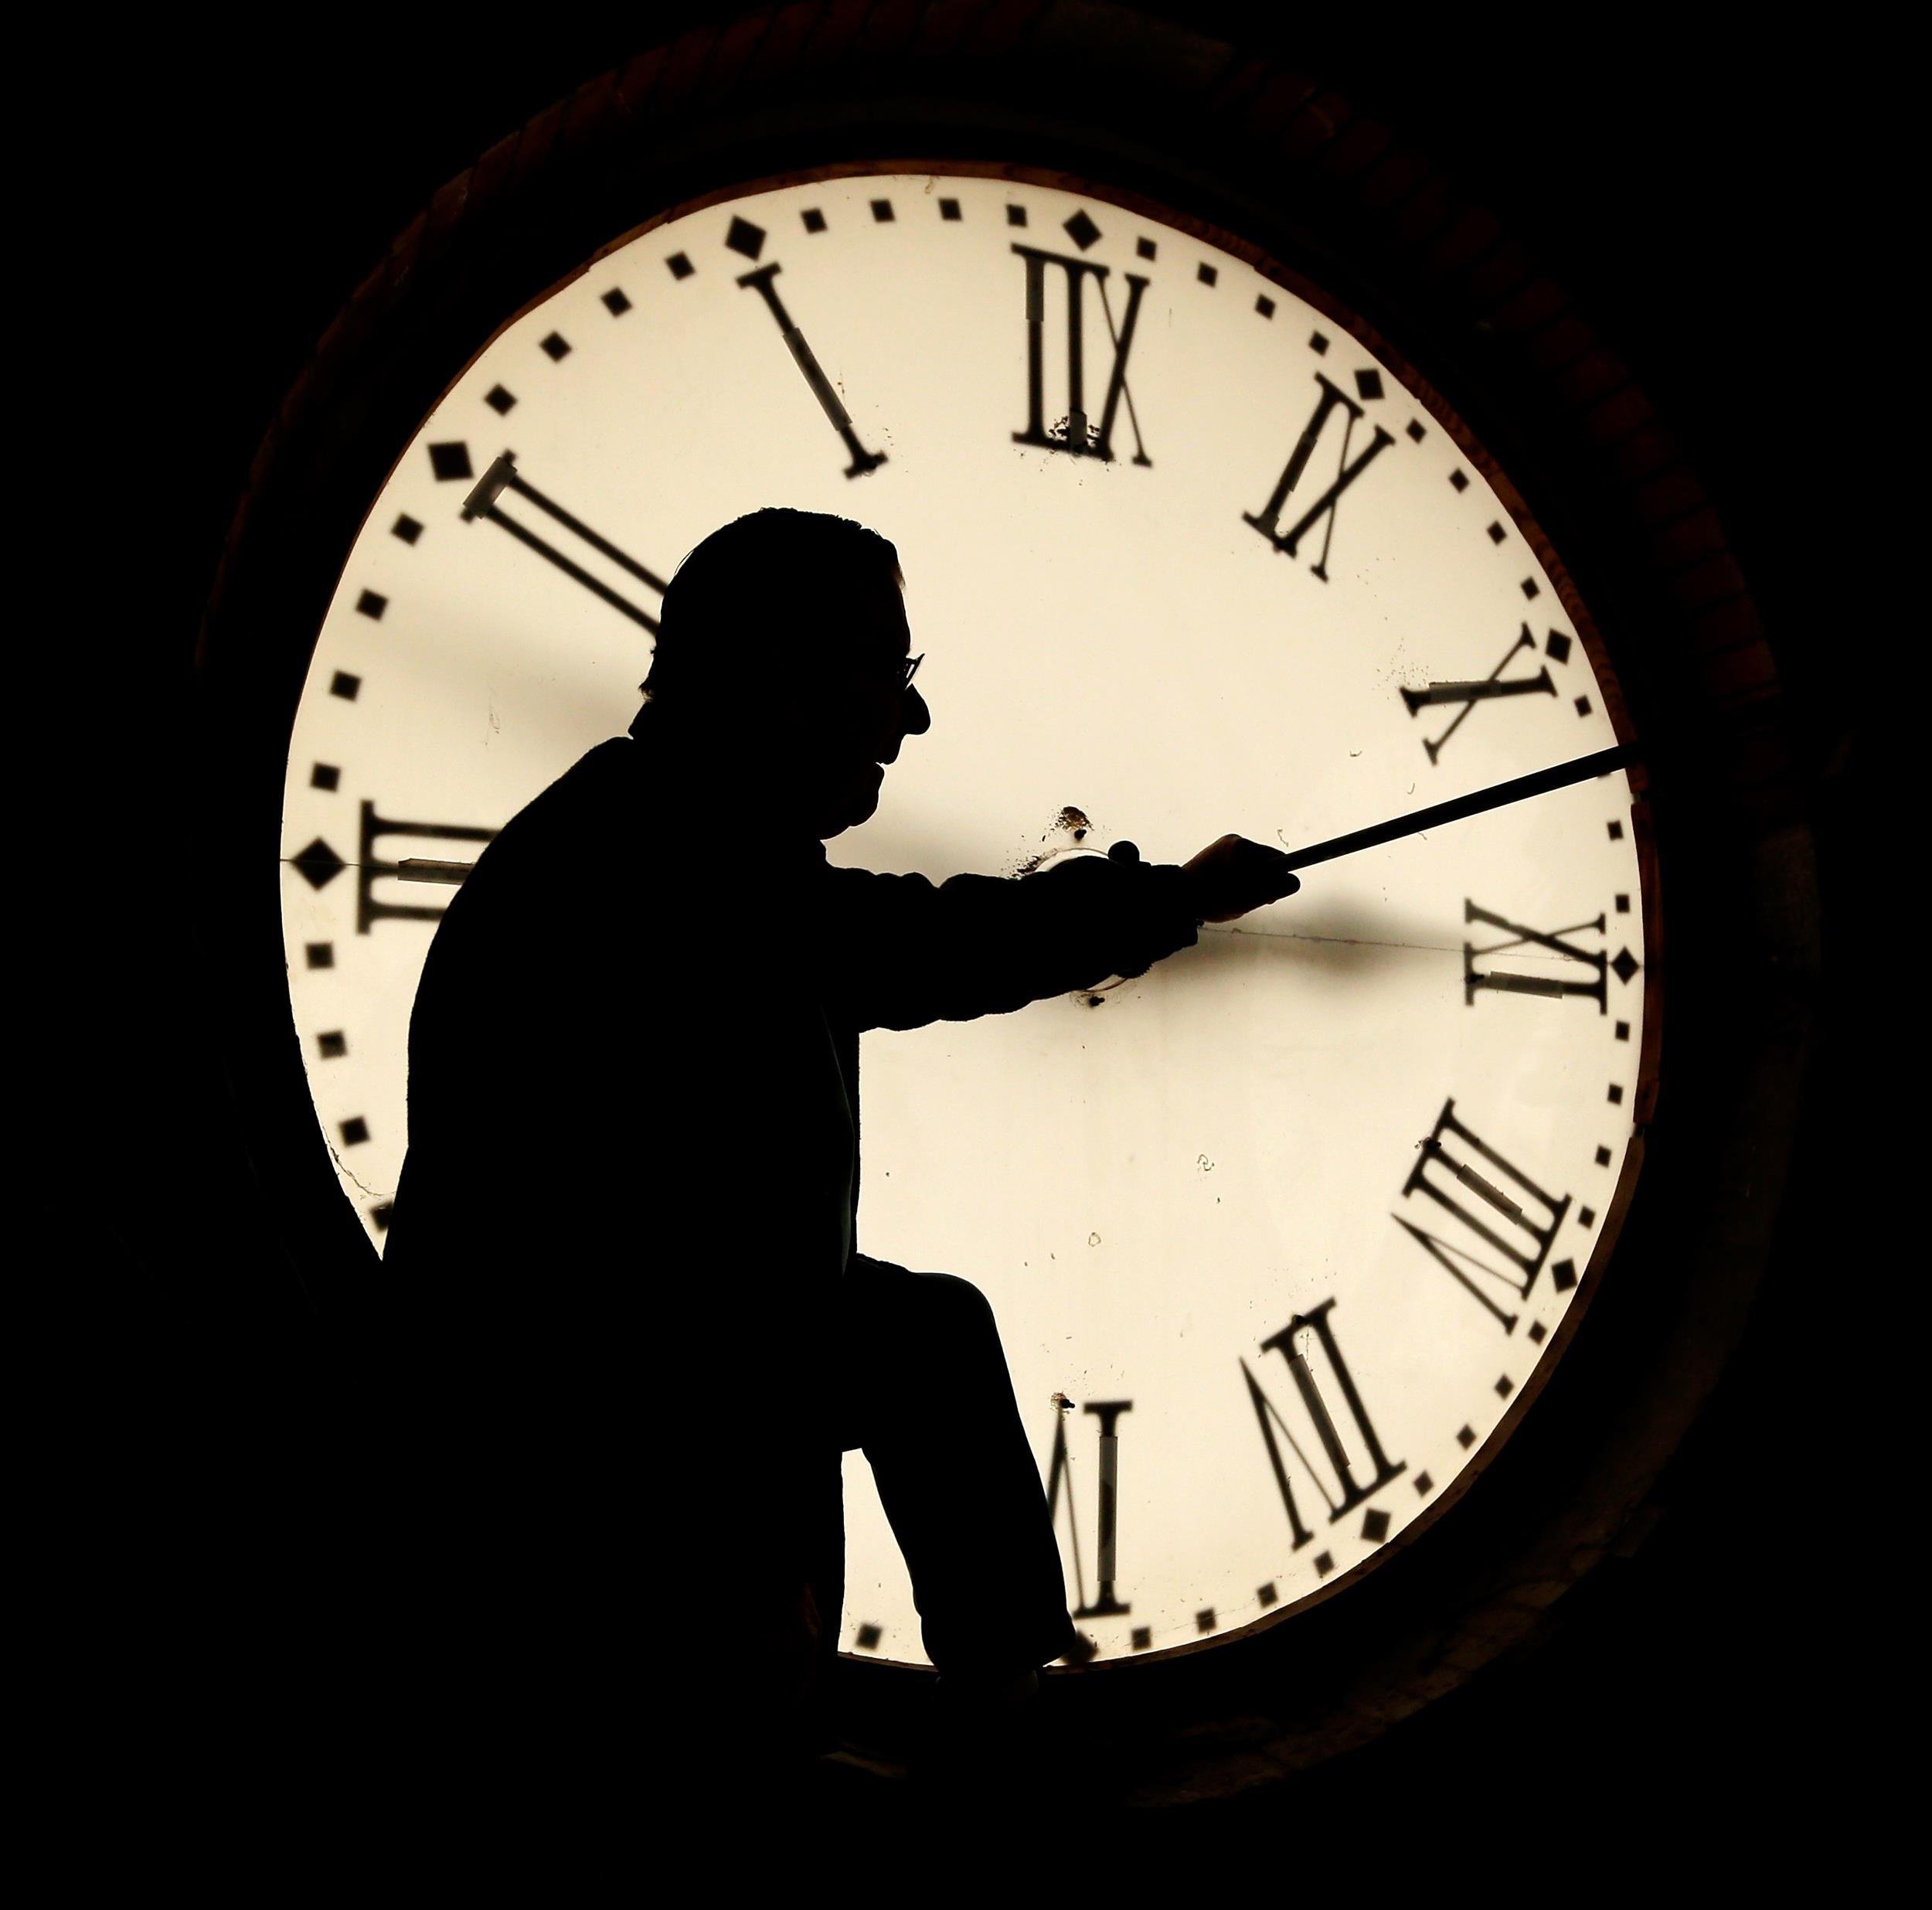 Time Change Clock Bcecddacae